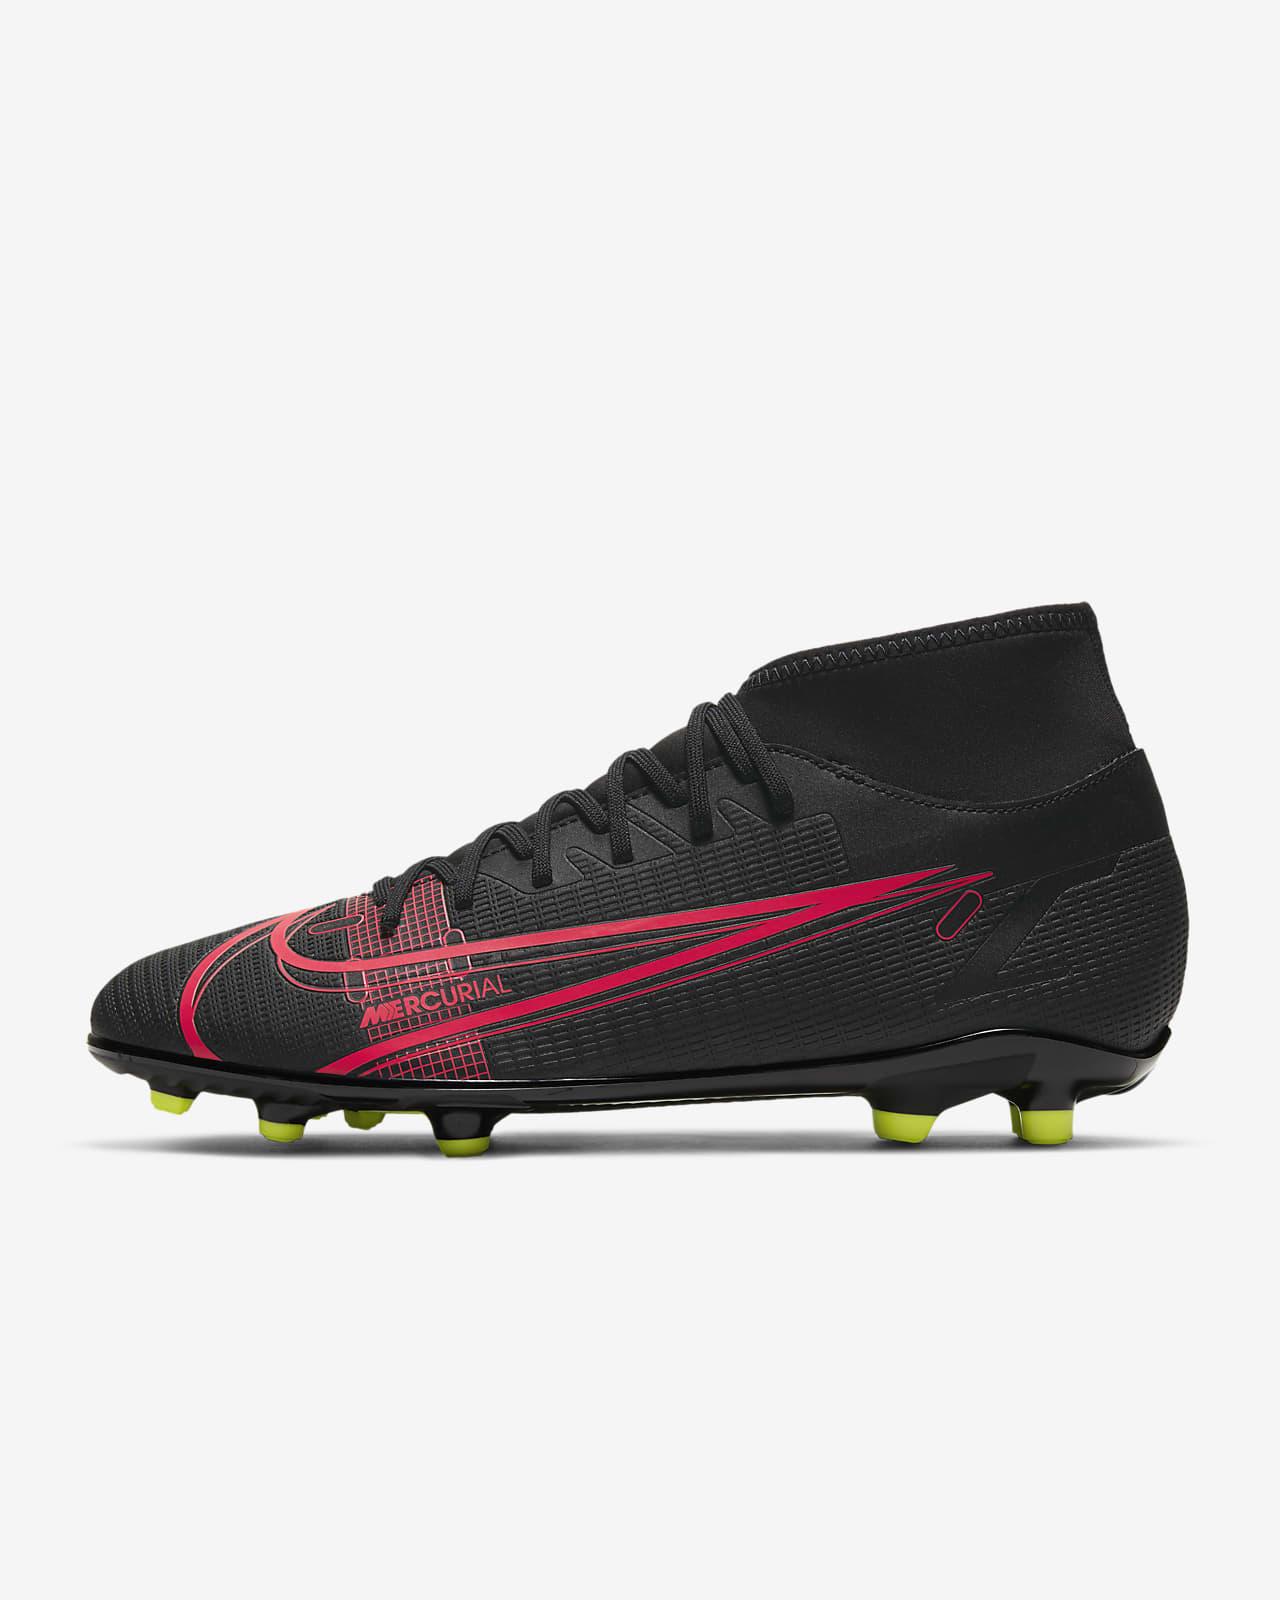 Chaussure de football à crampons multi-surfaces Nike Mercurial Superfly 8 Club MG